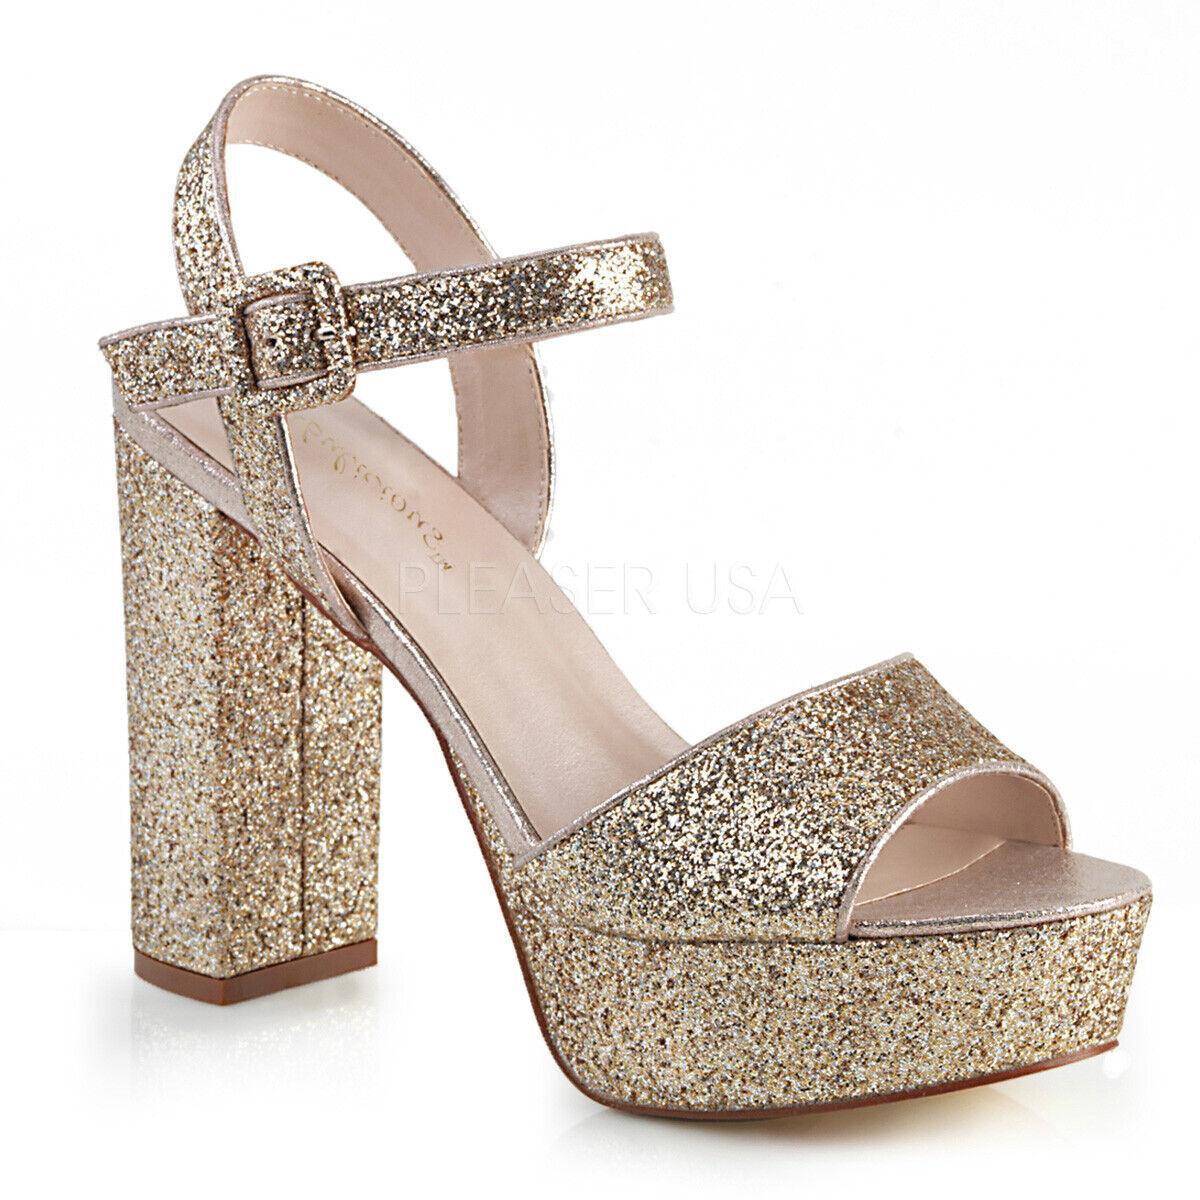 DEMONIA 5  Block Heel gold Glitter Platform Women shoes Ankle Strap Sandals